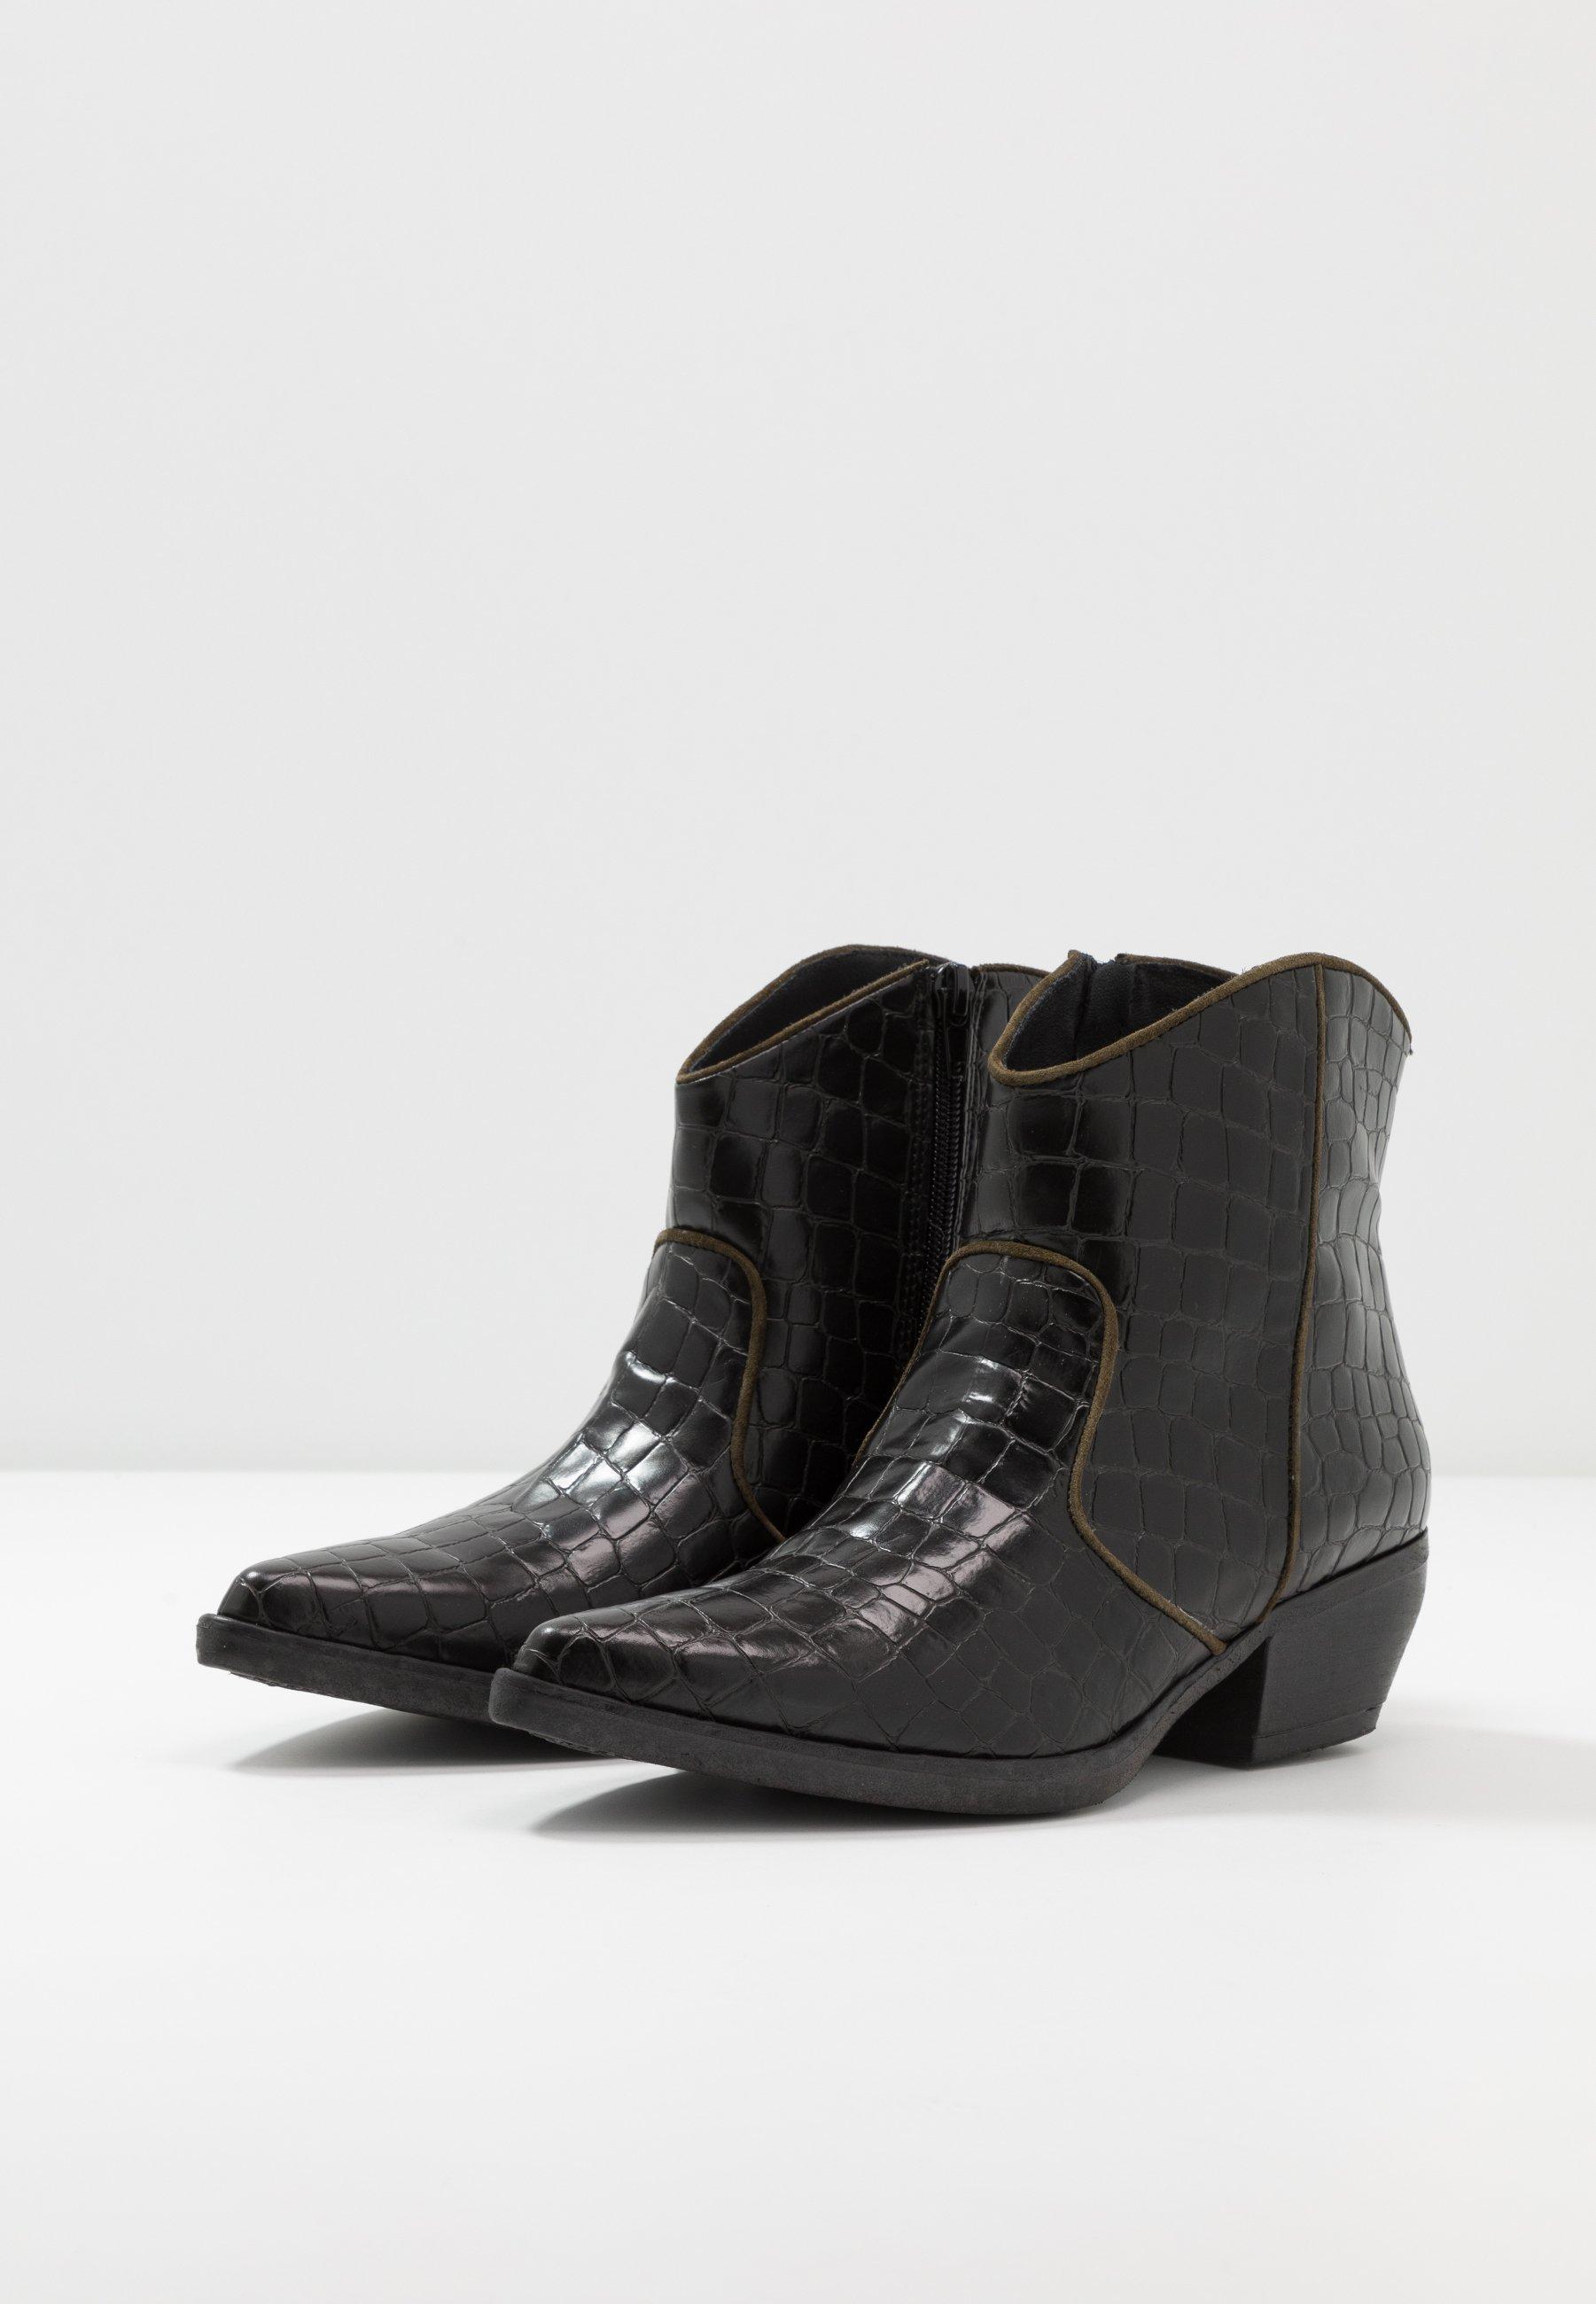 Tosca Blu SOFY - Ankle Boot - nero   Damen Schuhe 2020